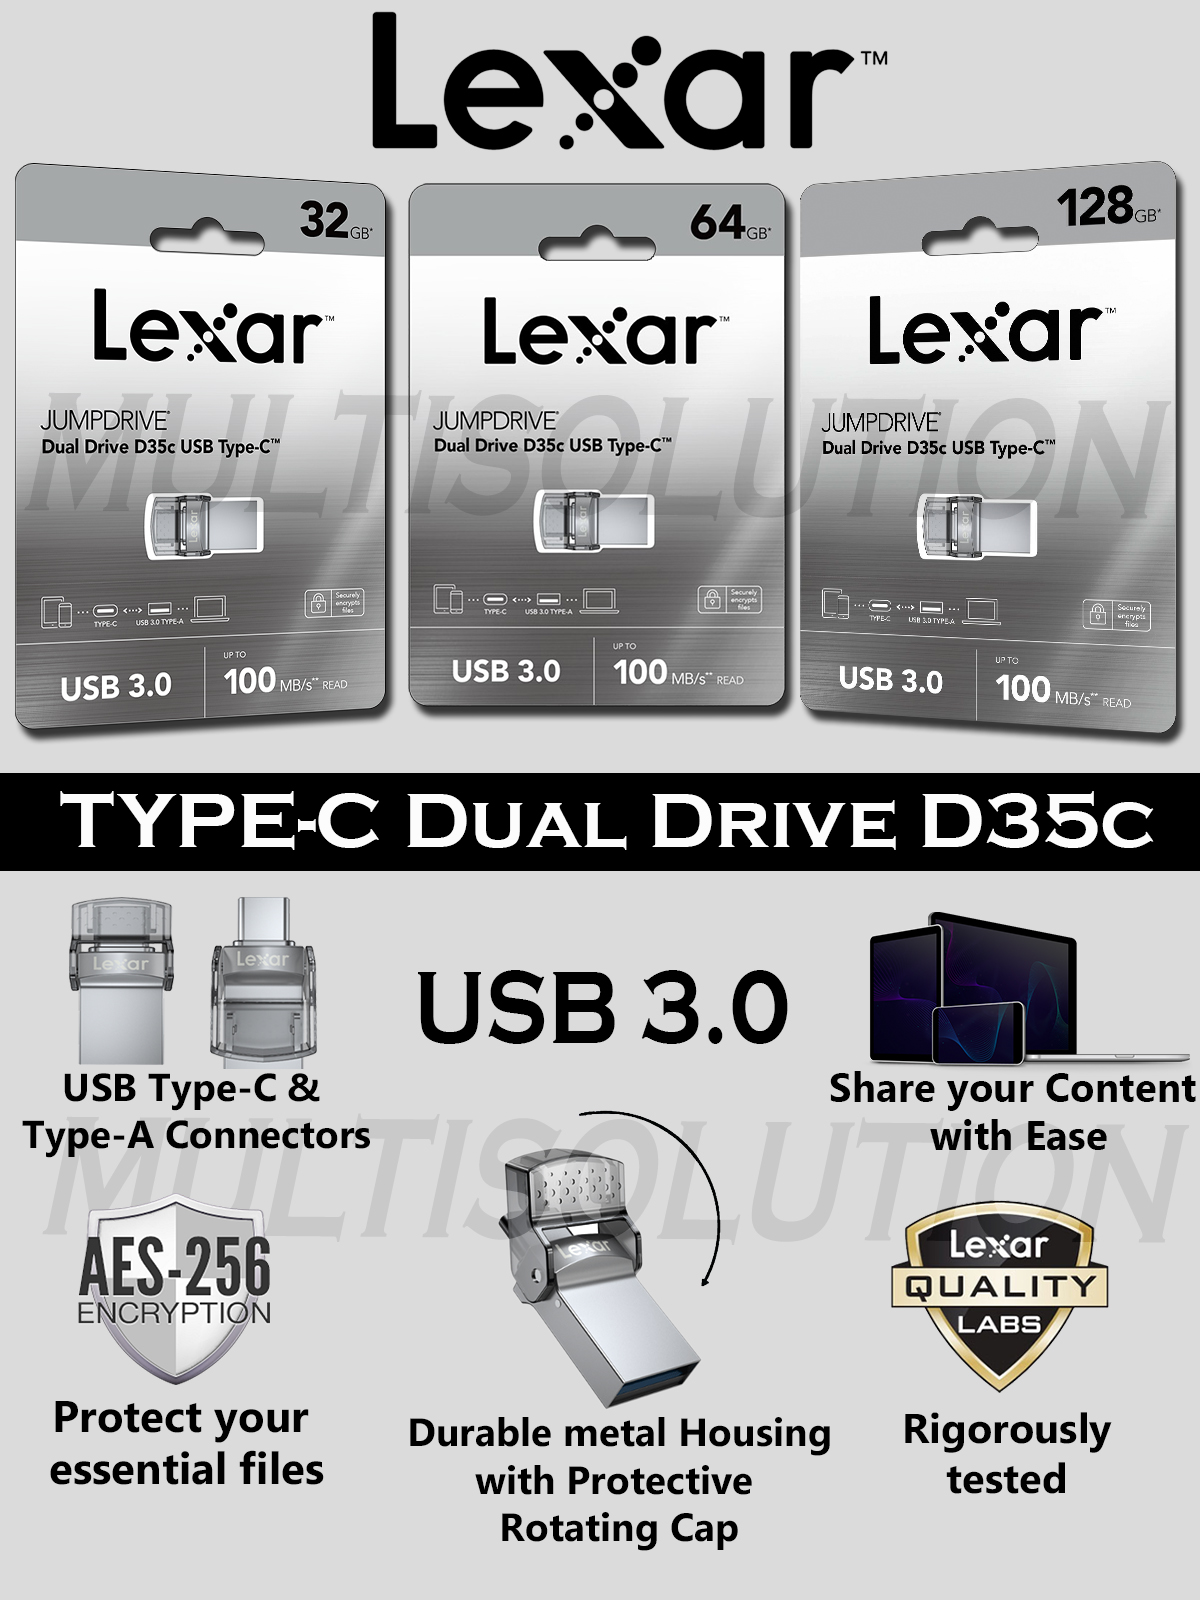 Type-C OTG Dual Drive Lexar Jump Drive D35c USB 3.0 Type C - 2 Years Warranty